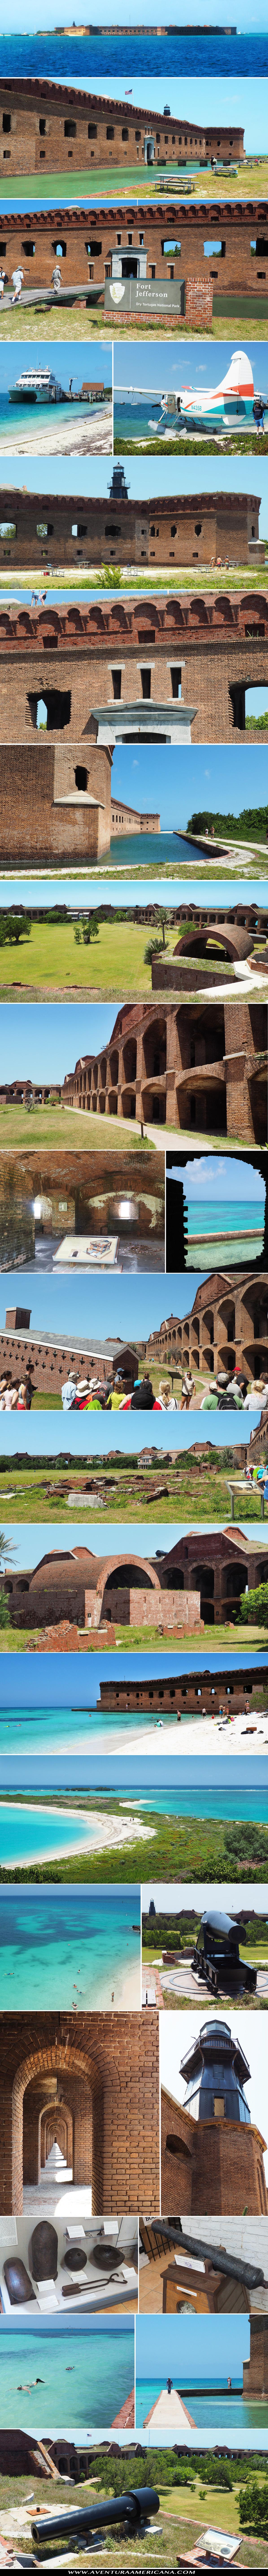 Fort Jefferson-